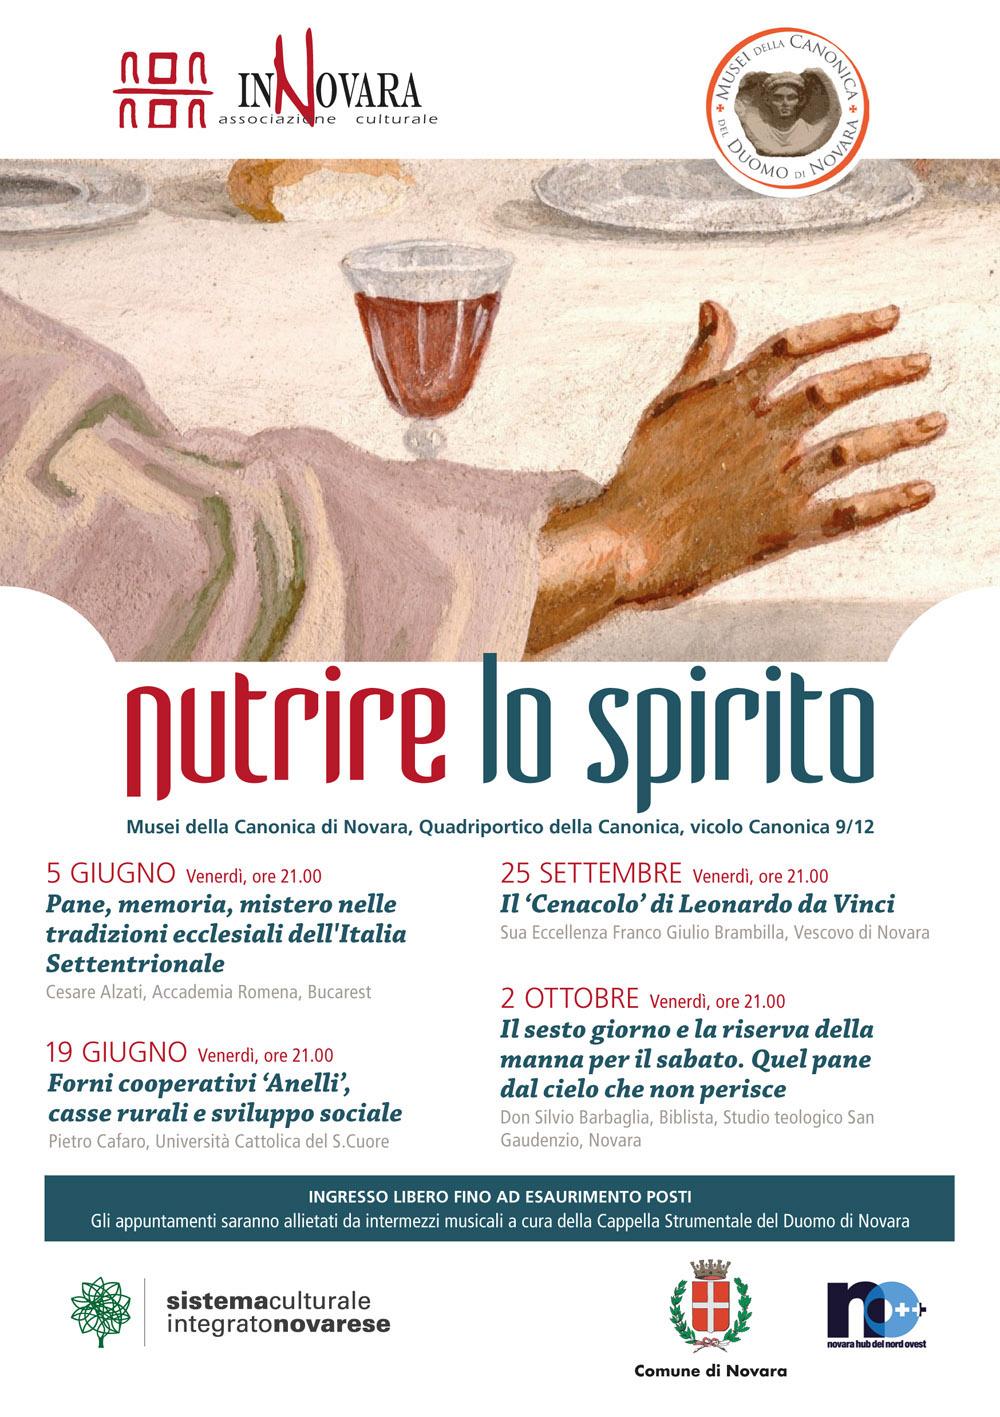 InNovara - Flyer 148x210 - Nutrire lo spirito + Programma Maggio